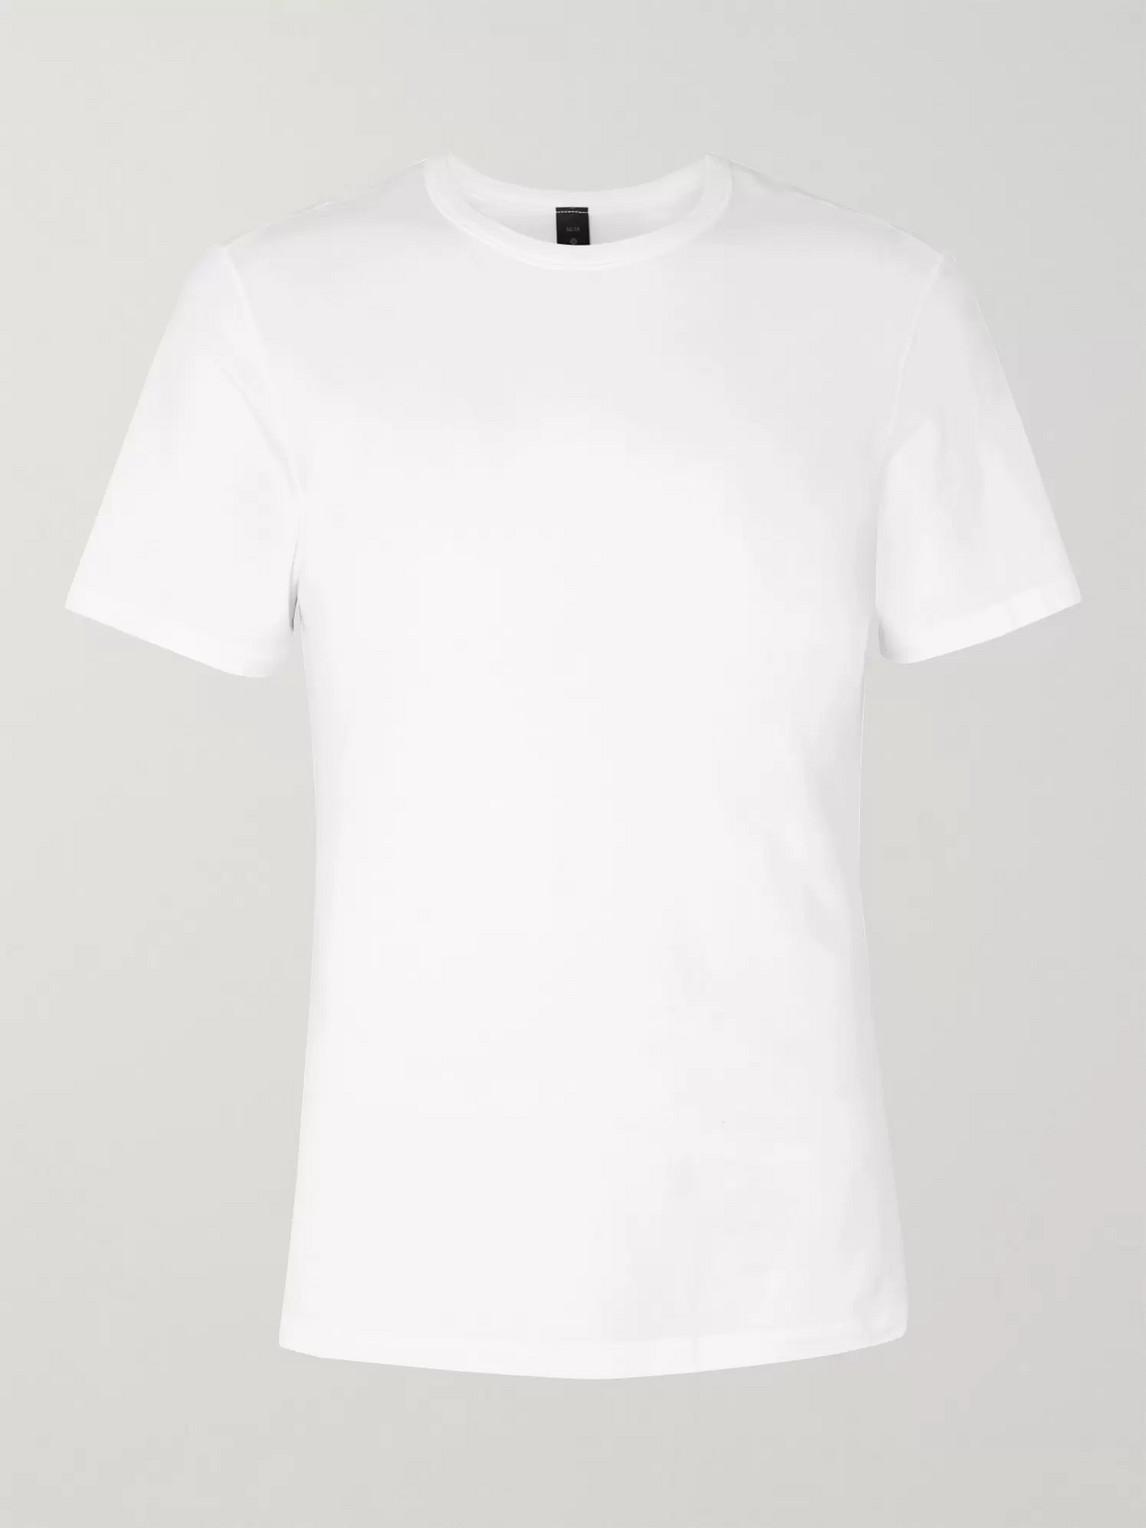 lululemon - 5-year basic vitasea t-shirt - men - white